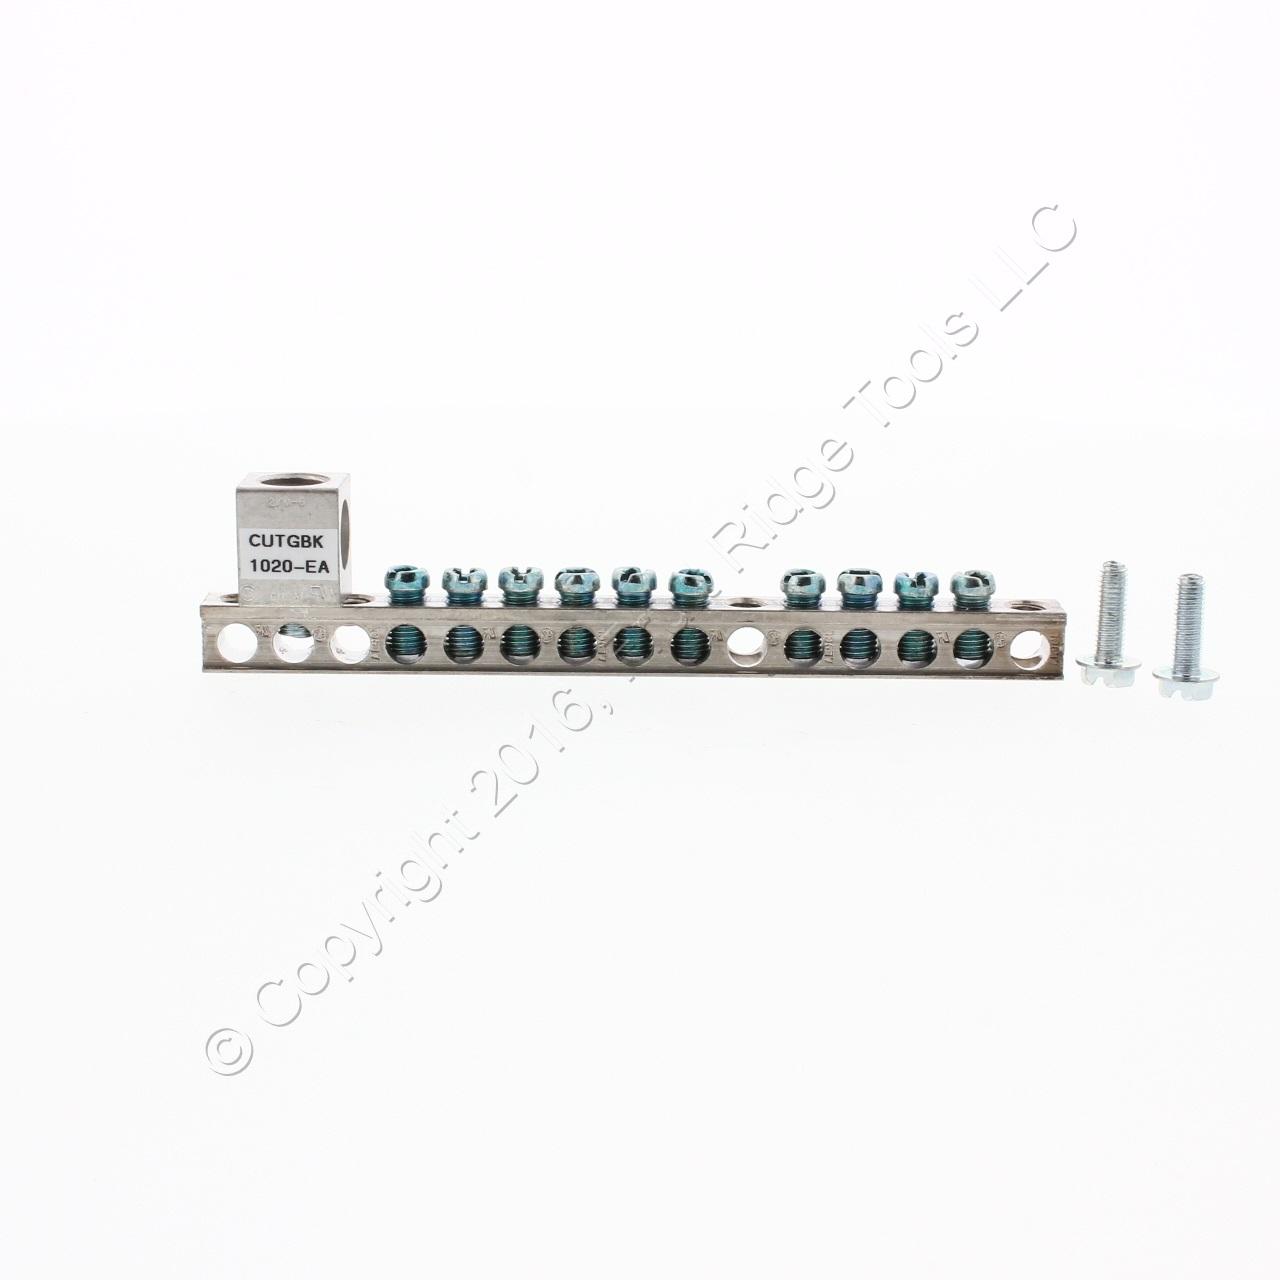 12 Cutler Hammer GBK21 21 Circuit Series A Ground Bar Kits FREE S/&H